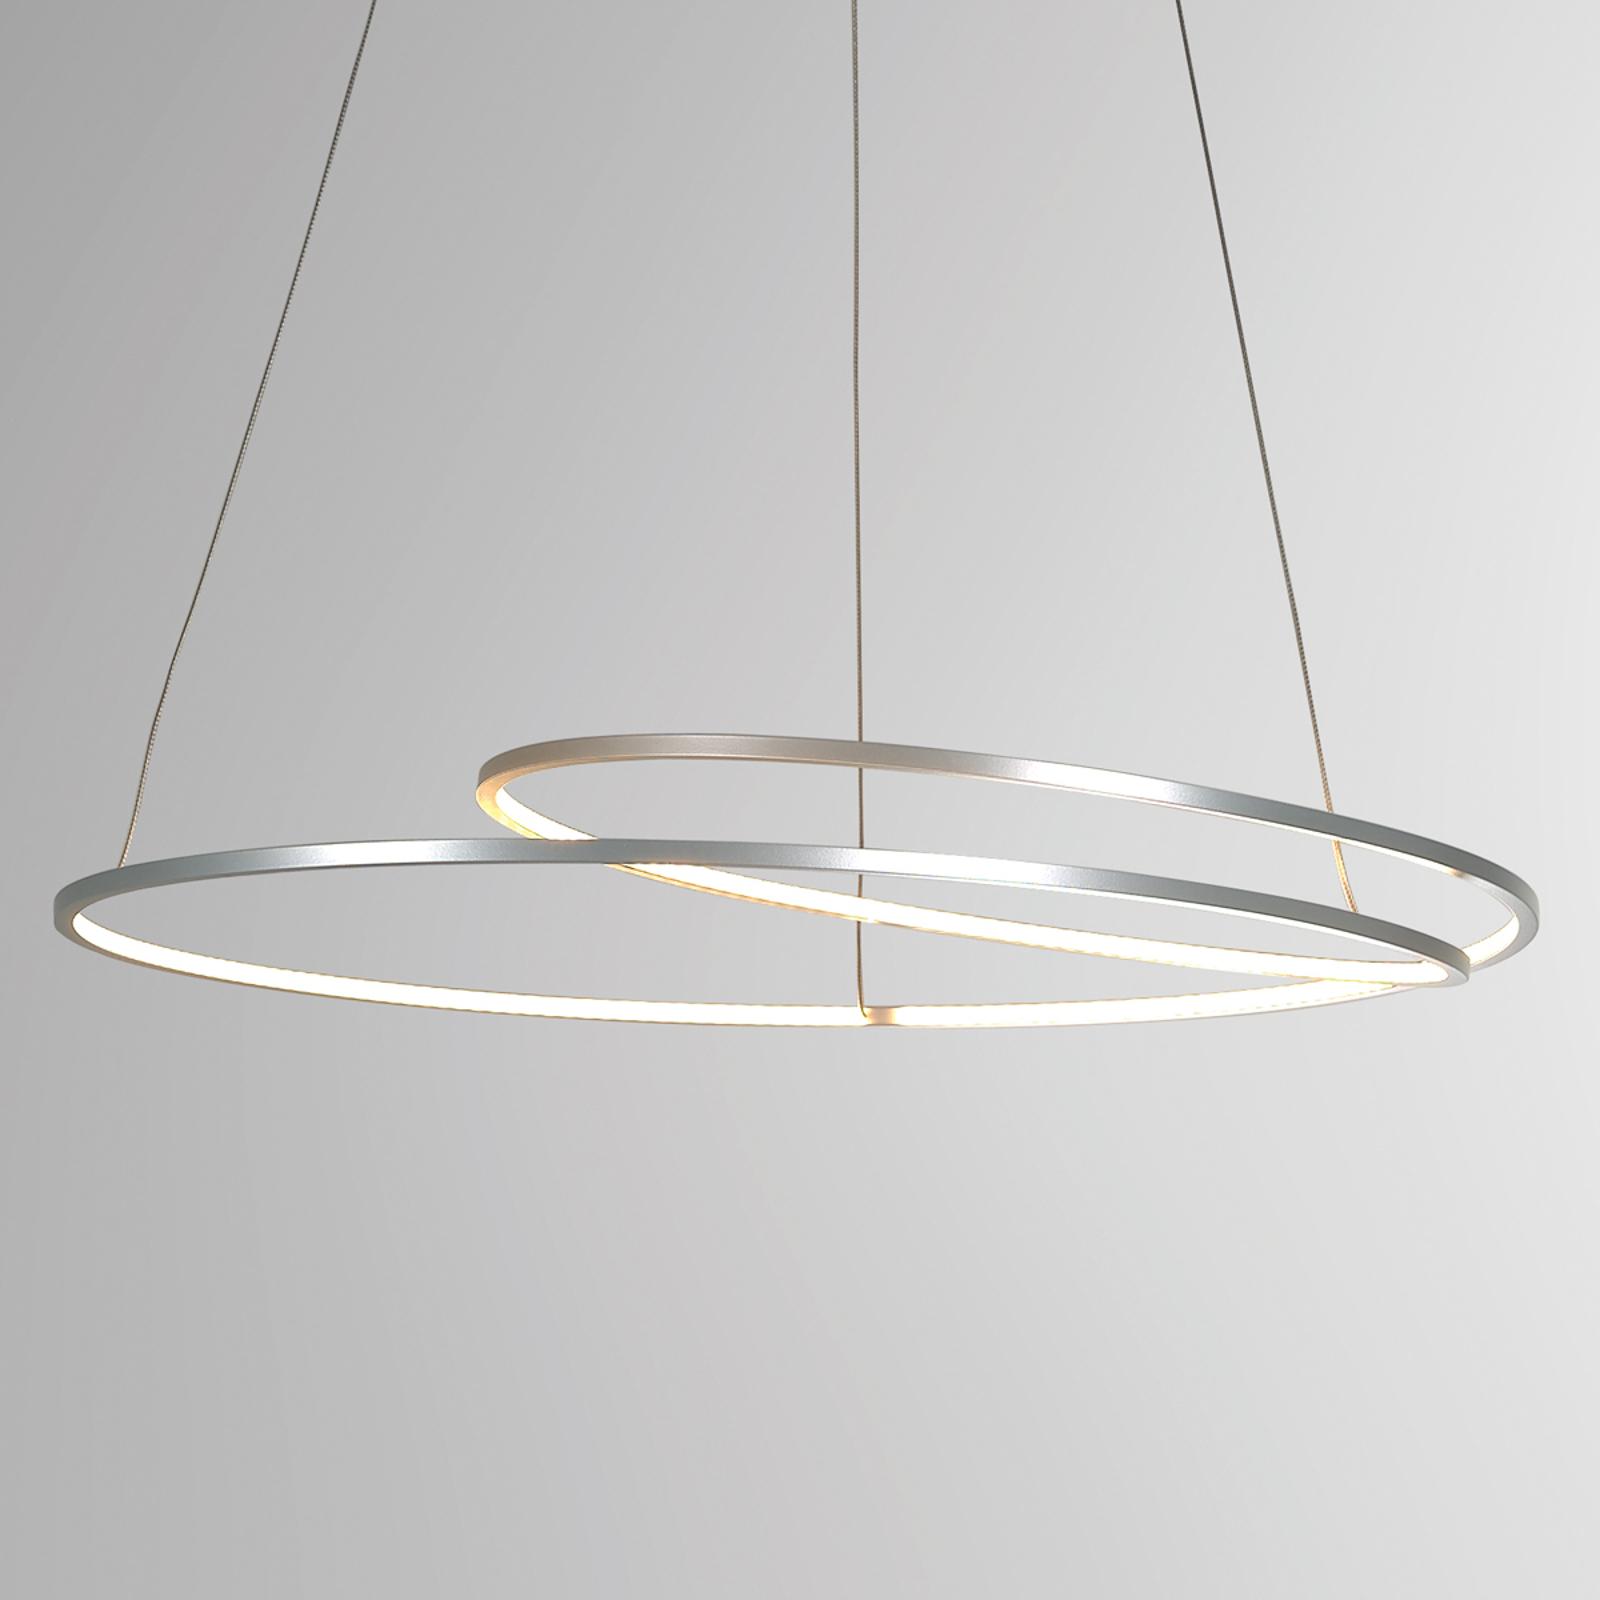 Filigranowa lampa wisząca LED At, ściemniana